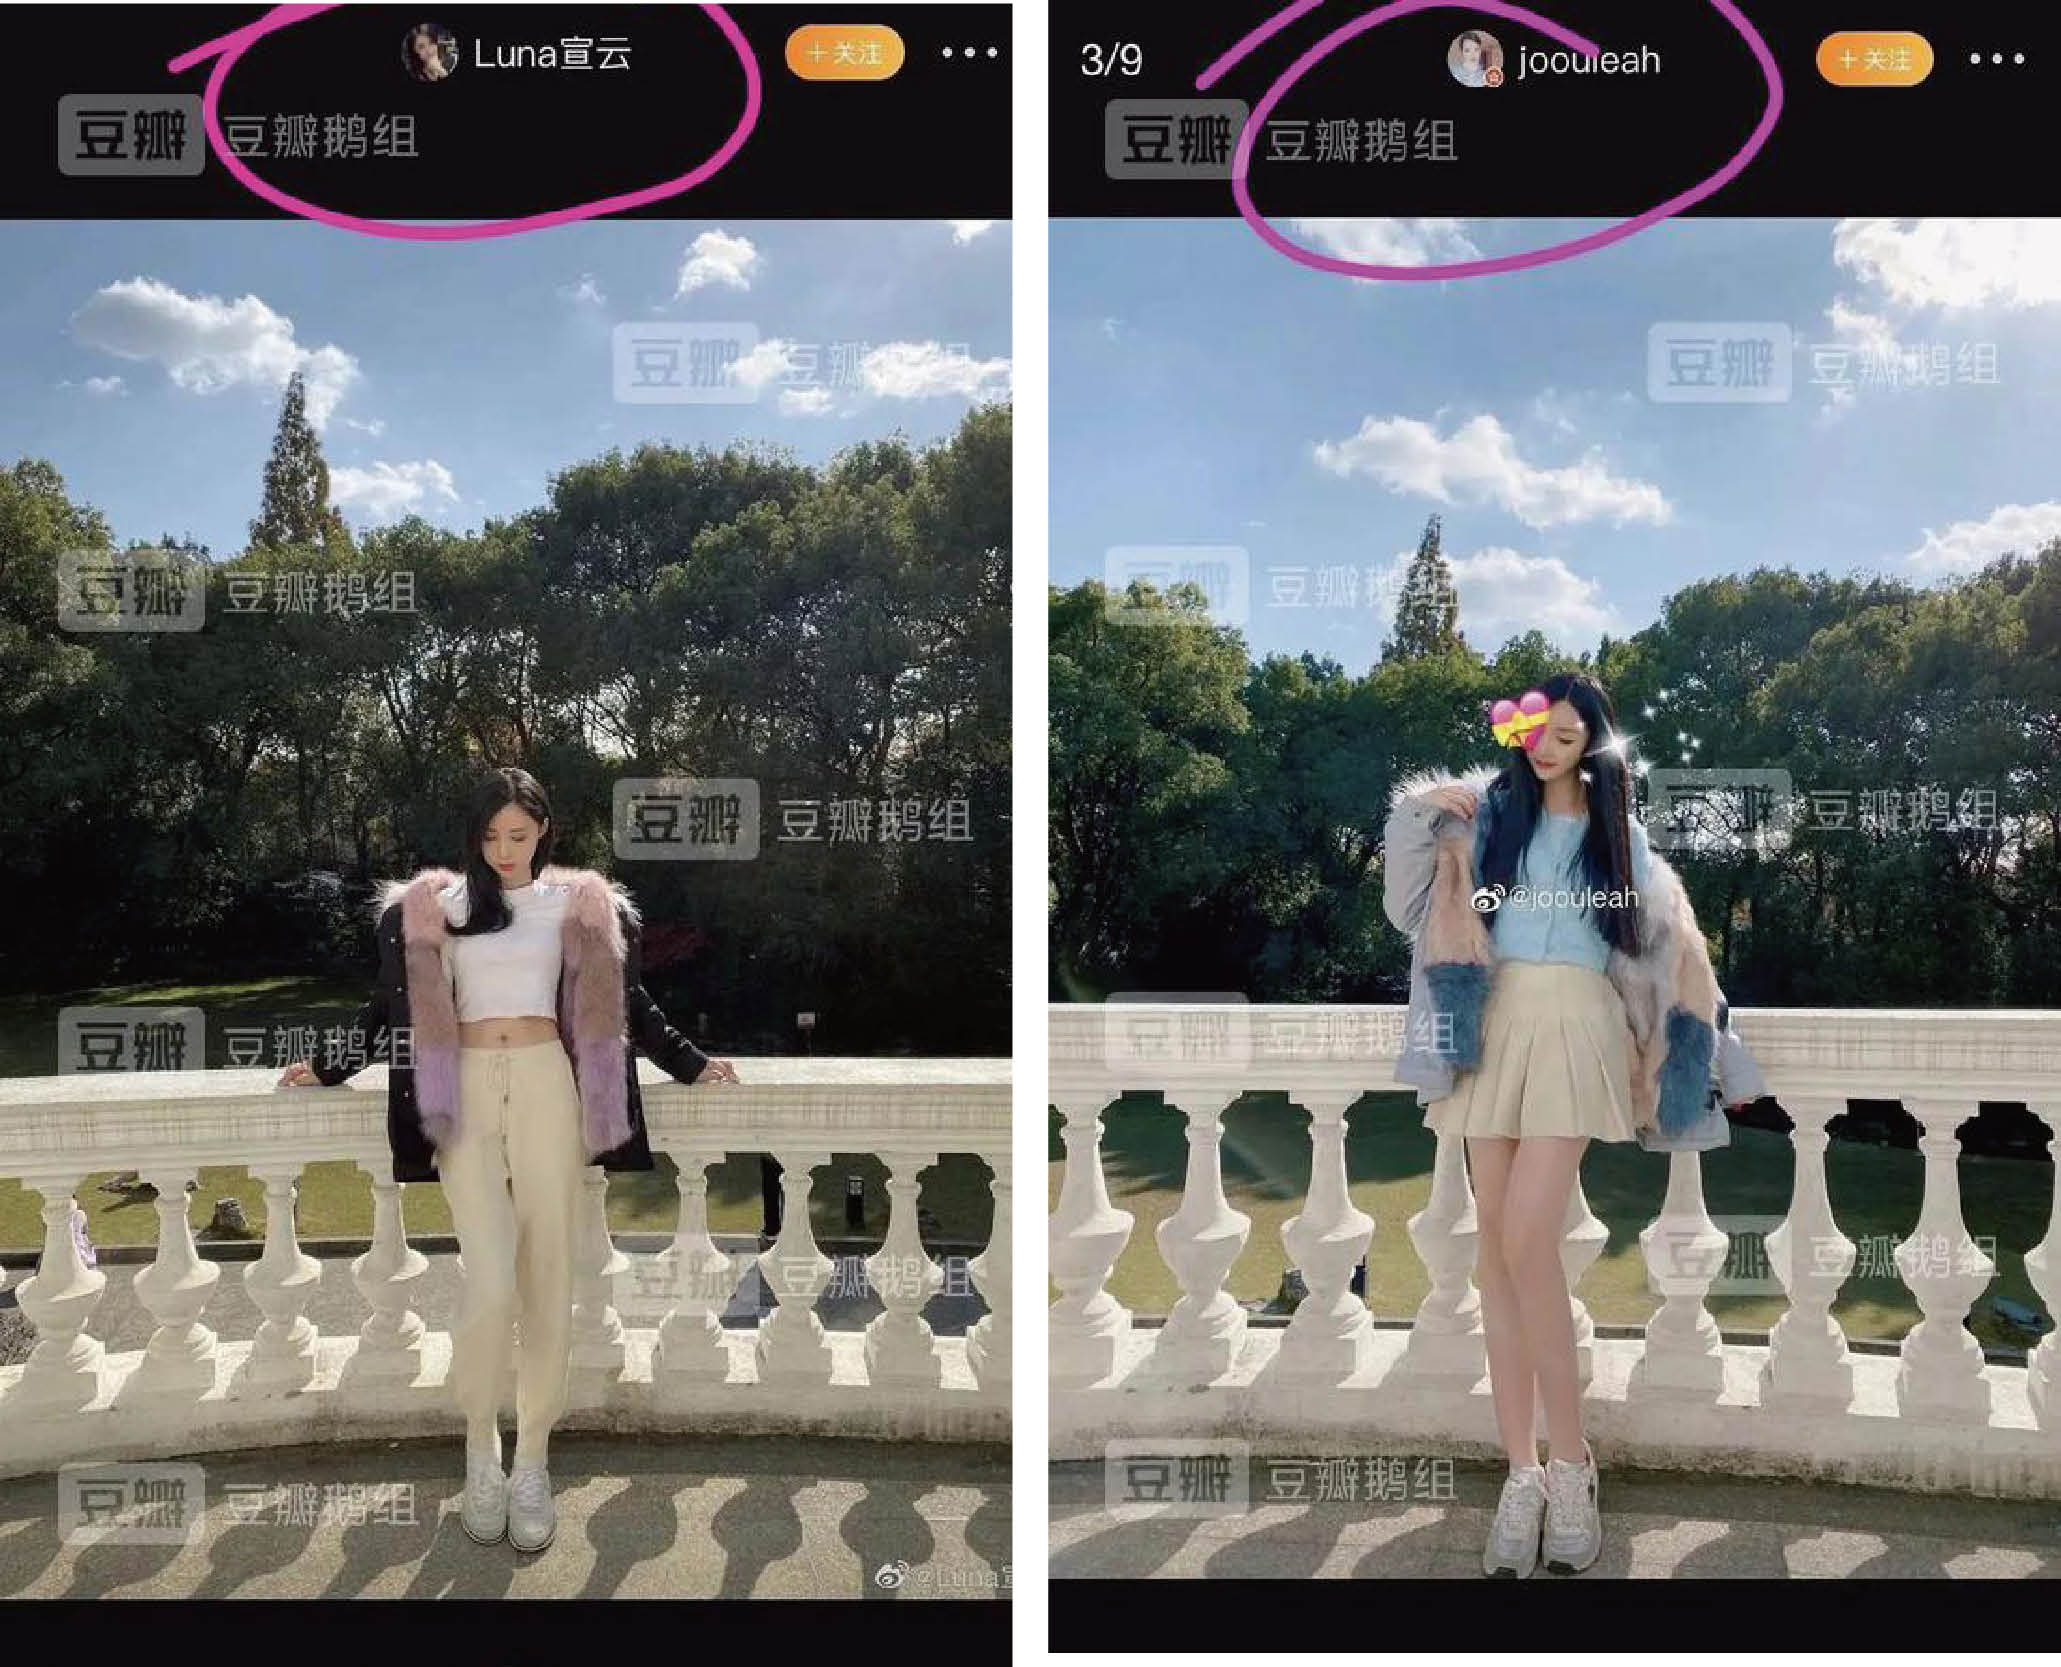 Luna(左圖)在社交平台的美照,被揭與其他網紅照片百分百雷同。(取材自微博)